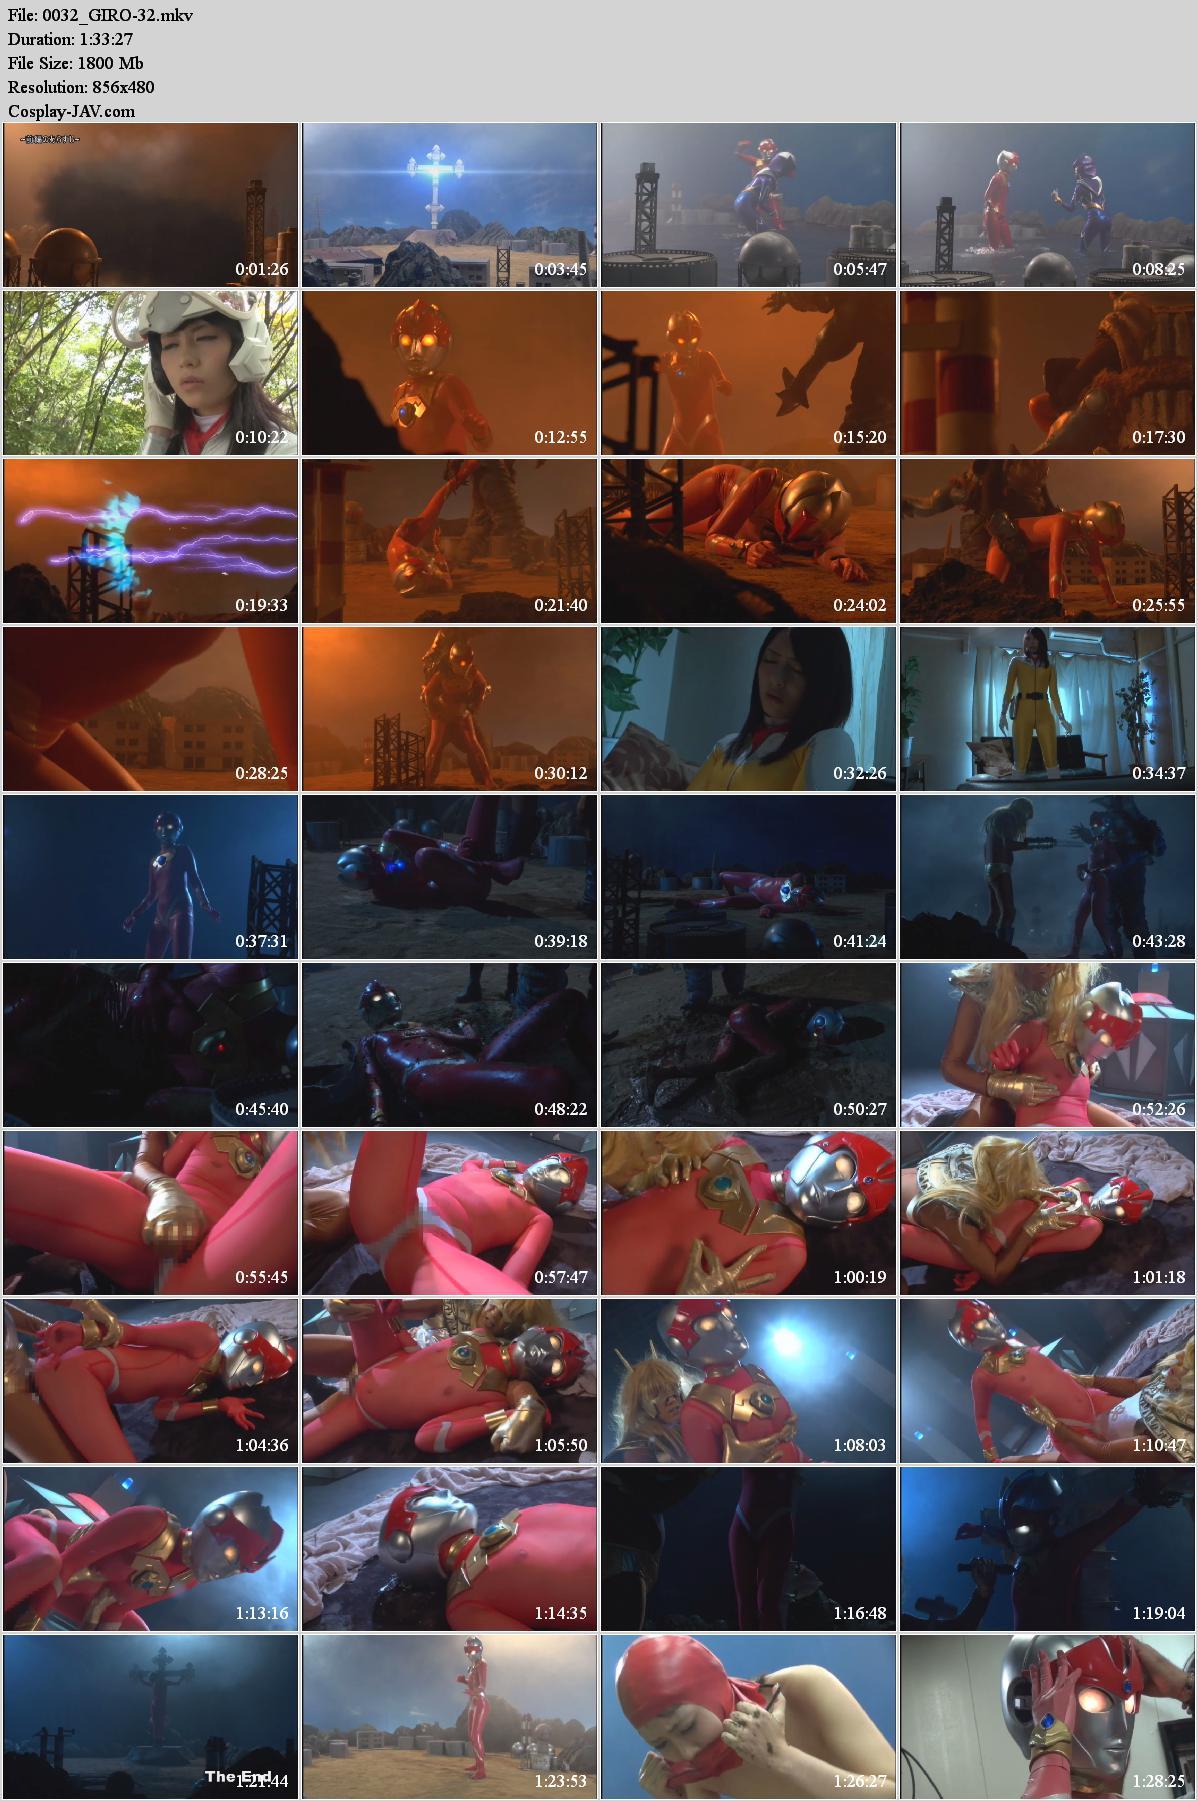 GIRO-32 Huge Heroine Lucia Sequel Humiliation, Domination, Breast Milk Splash Sakurai Ayu, Fukui Aya, Shindou Ayumi